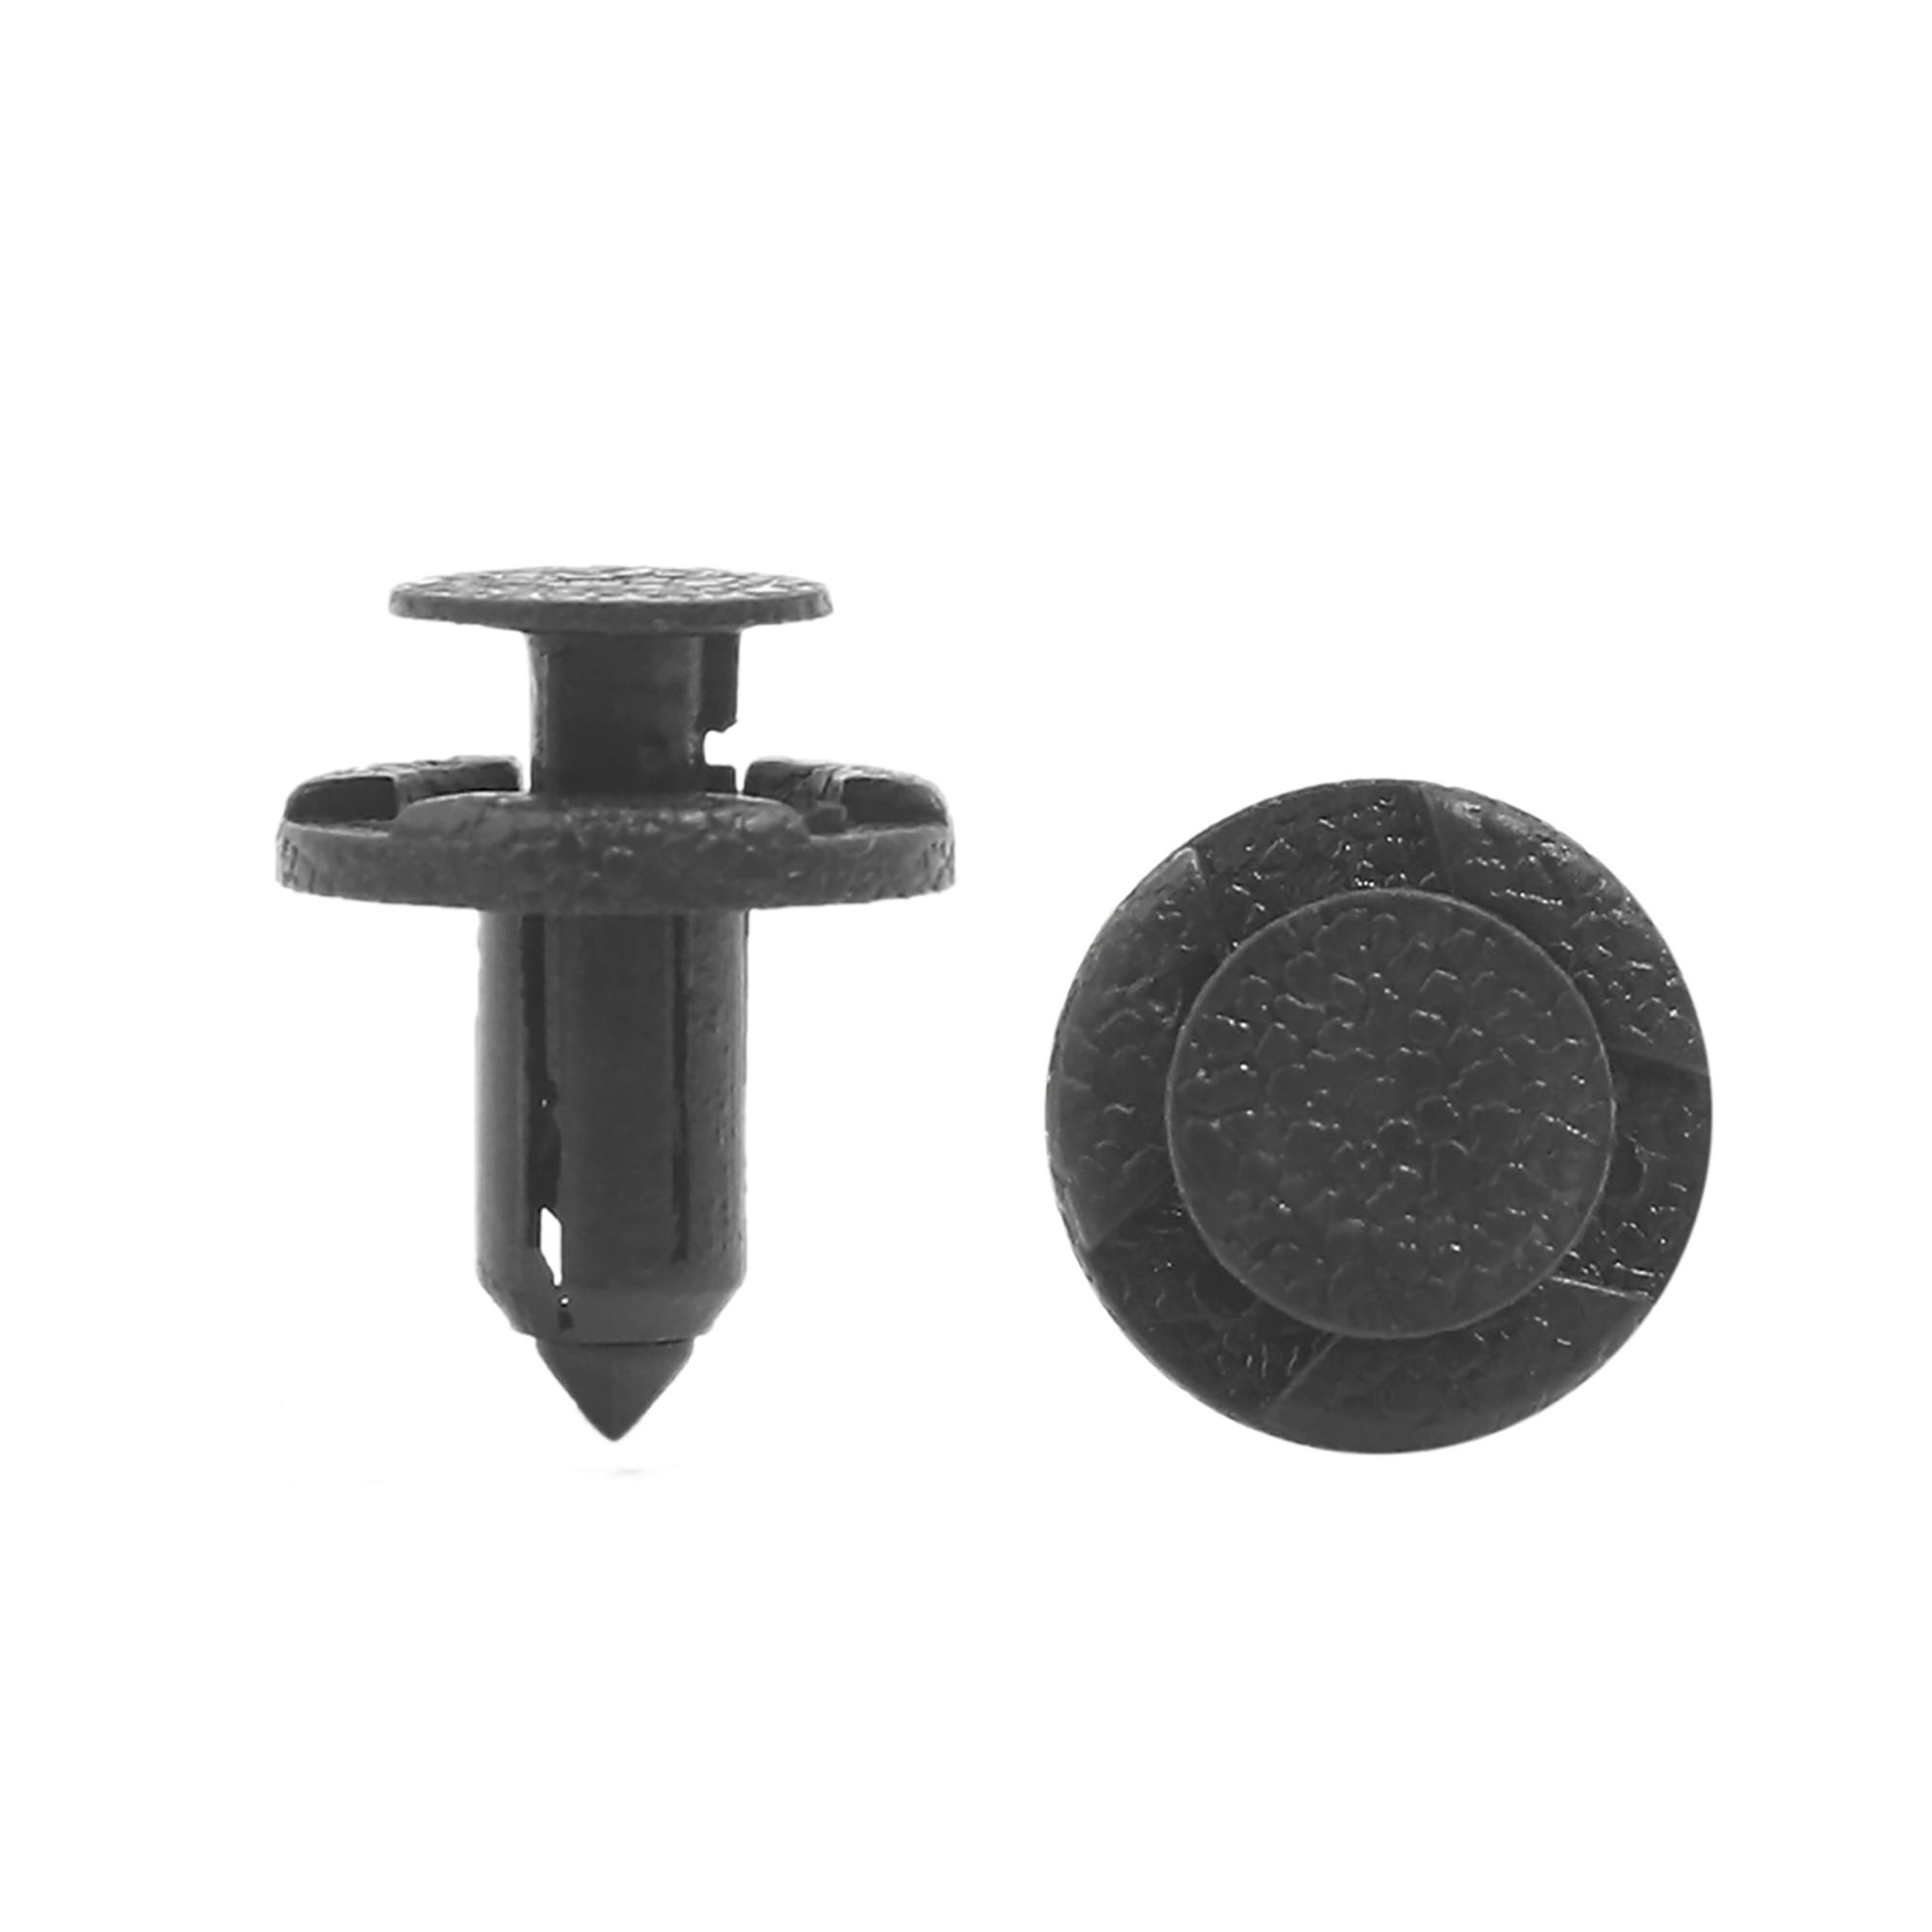 Universal Car Plastic Rivets Push Pin Fastener Fender Retainer Clip Black 100Pcs